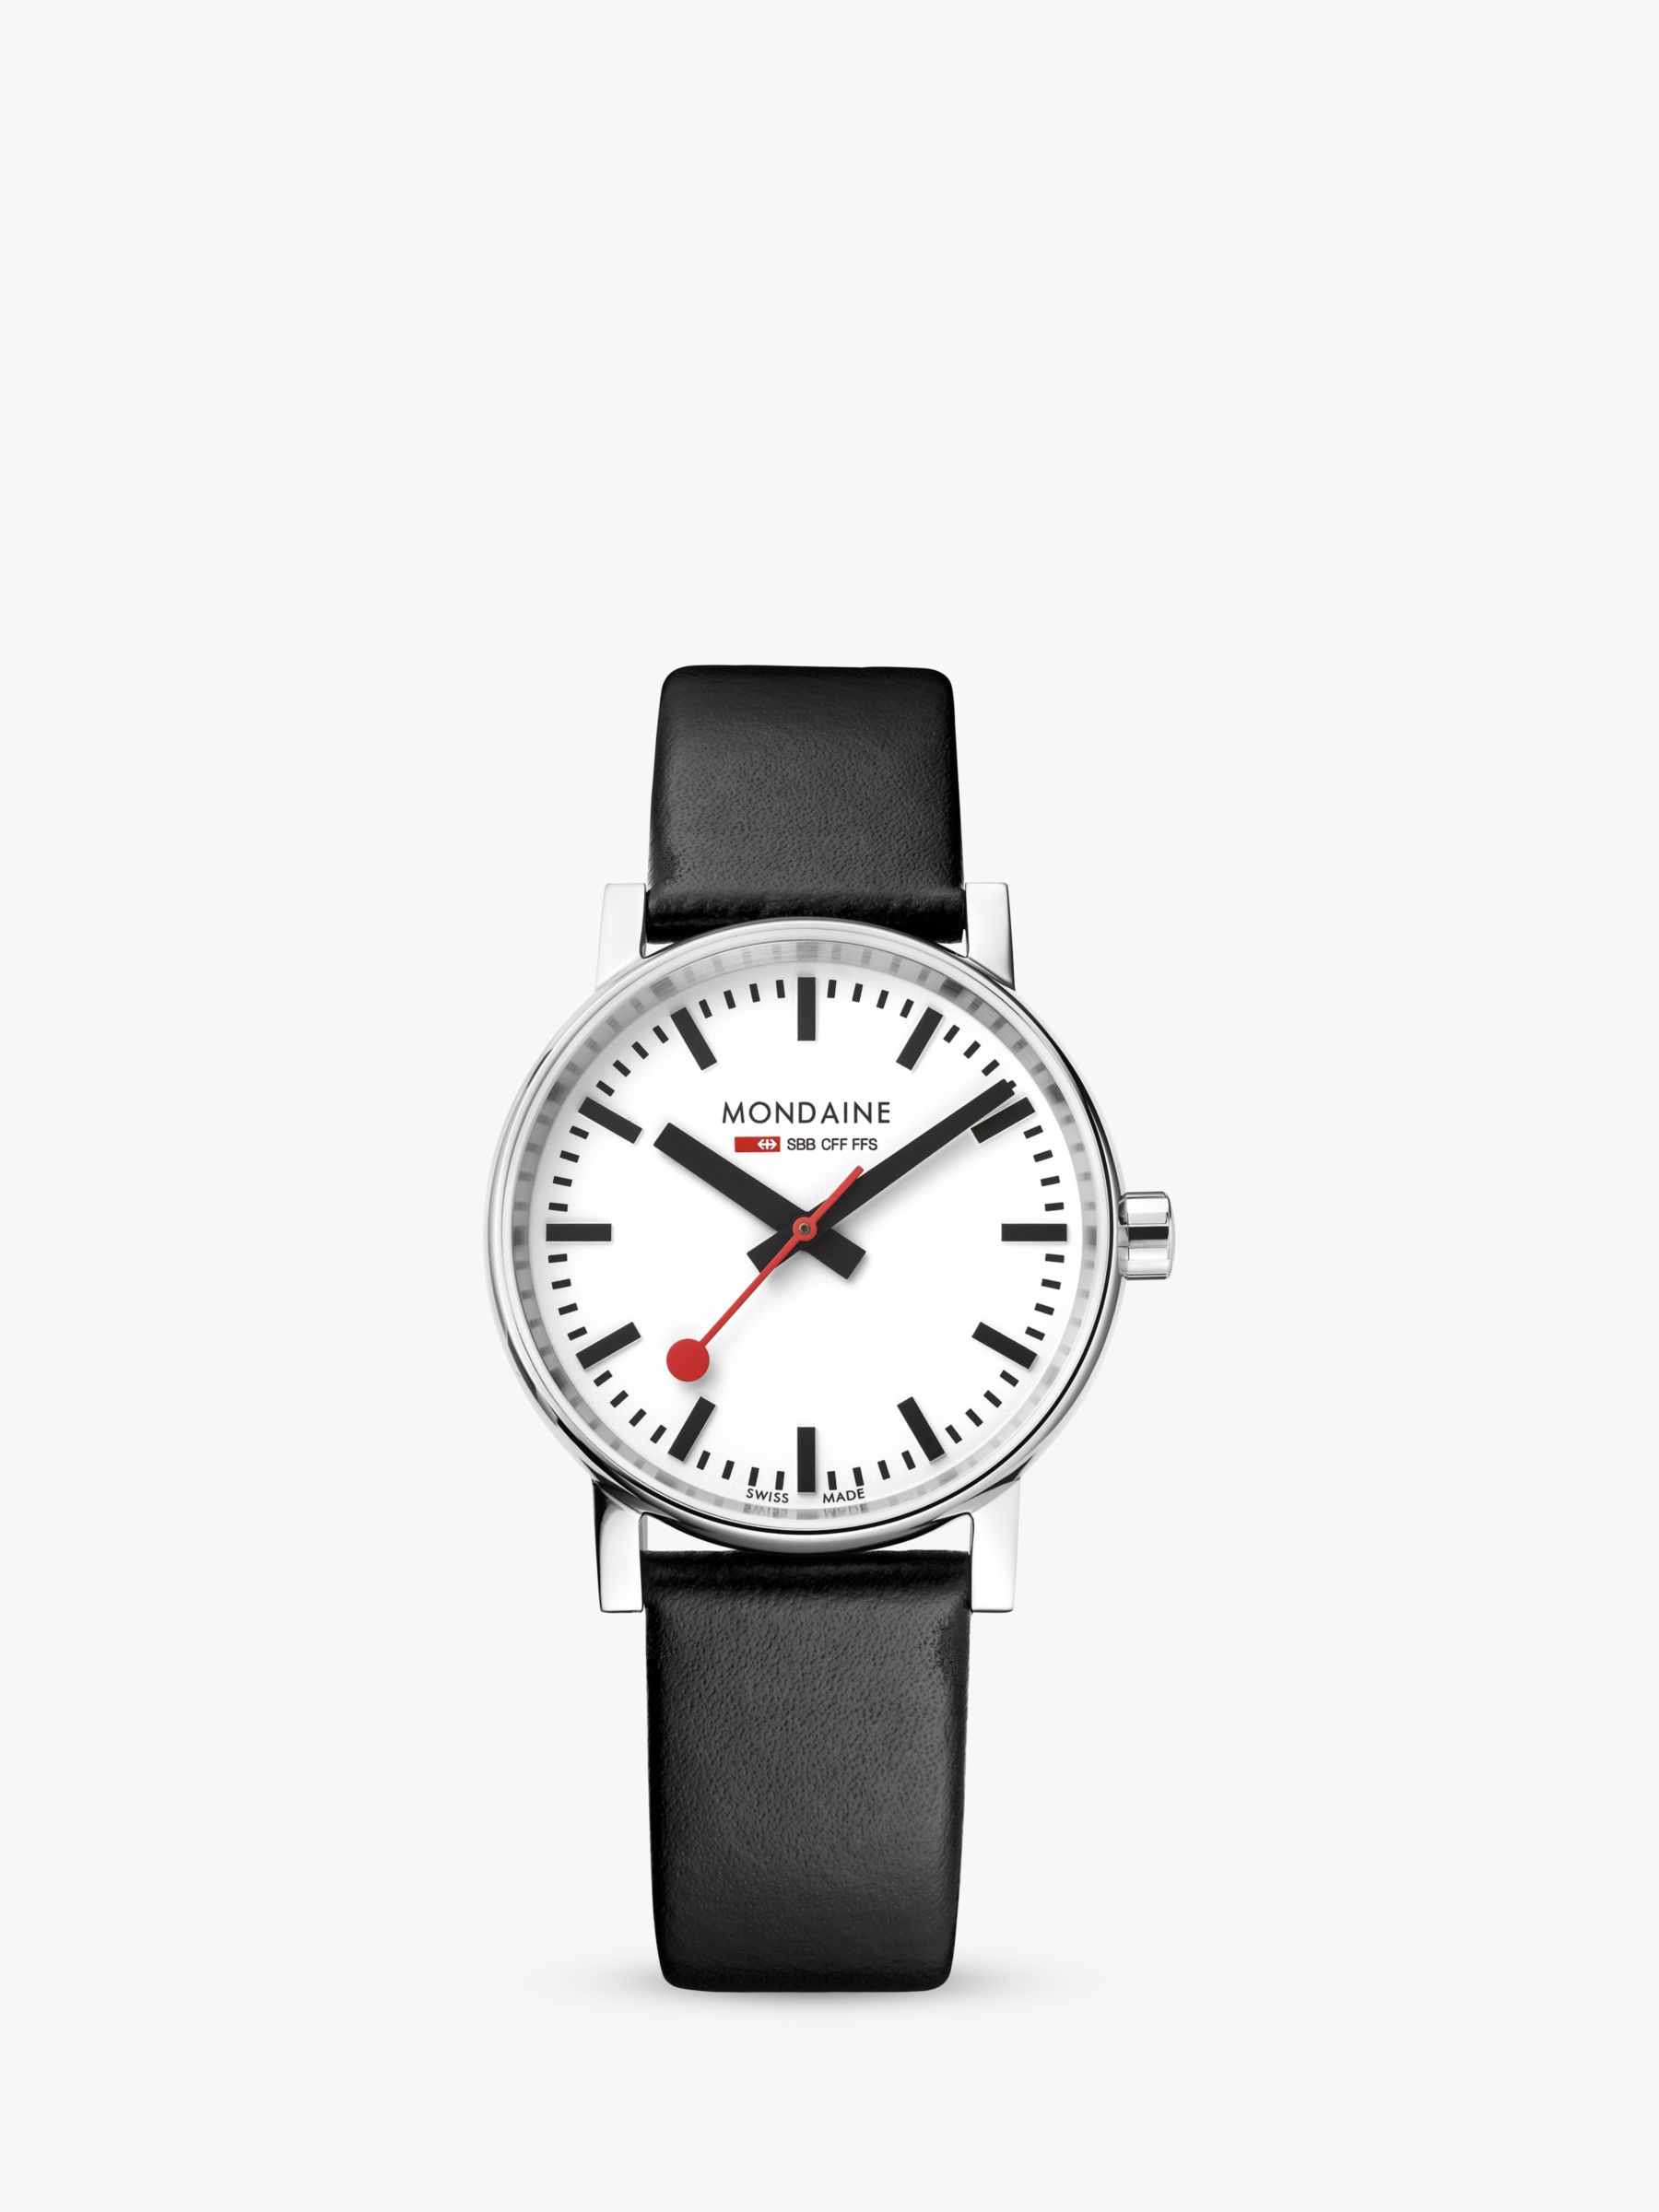 Mondaine Mondaine MSE.35110.LB Unisex Evo 2 Leather Strap Watch, Black/White